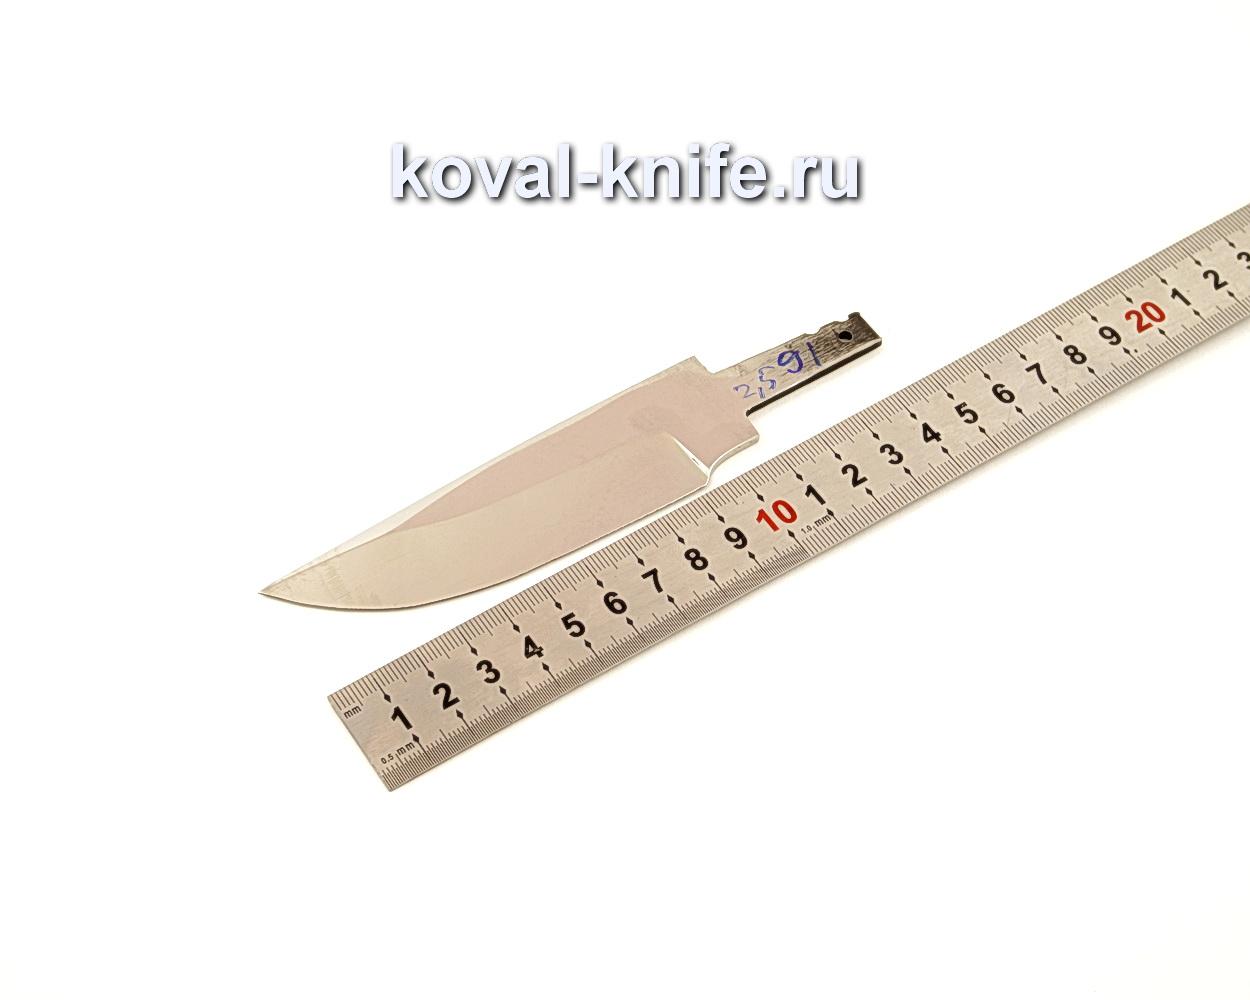 Клинок для ножа из кованой 95Х18 N91